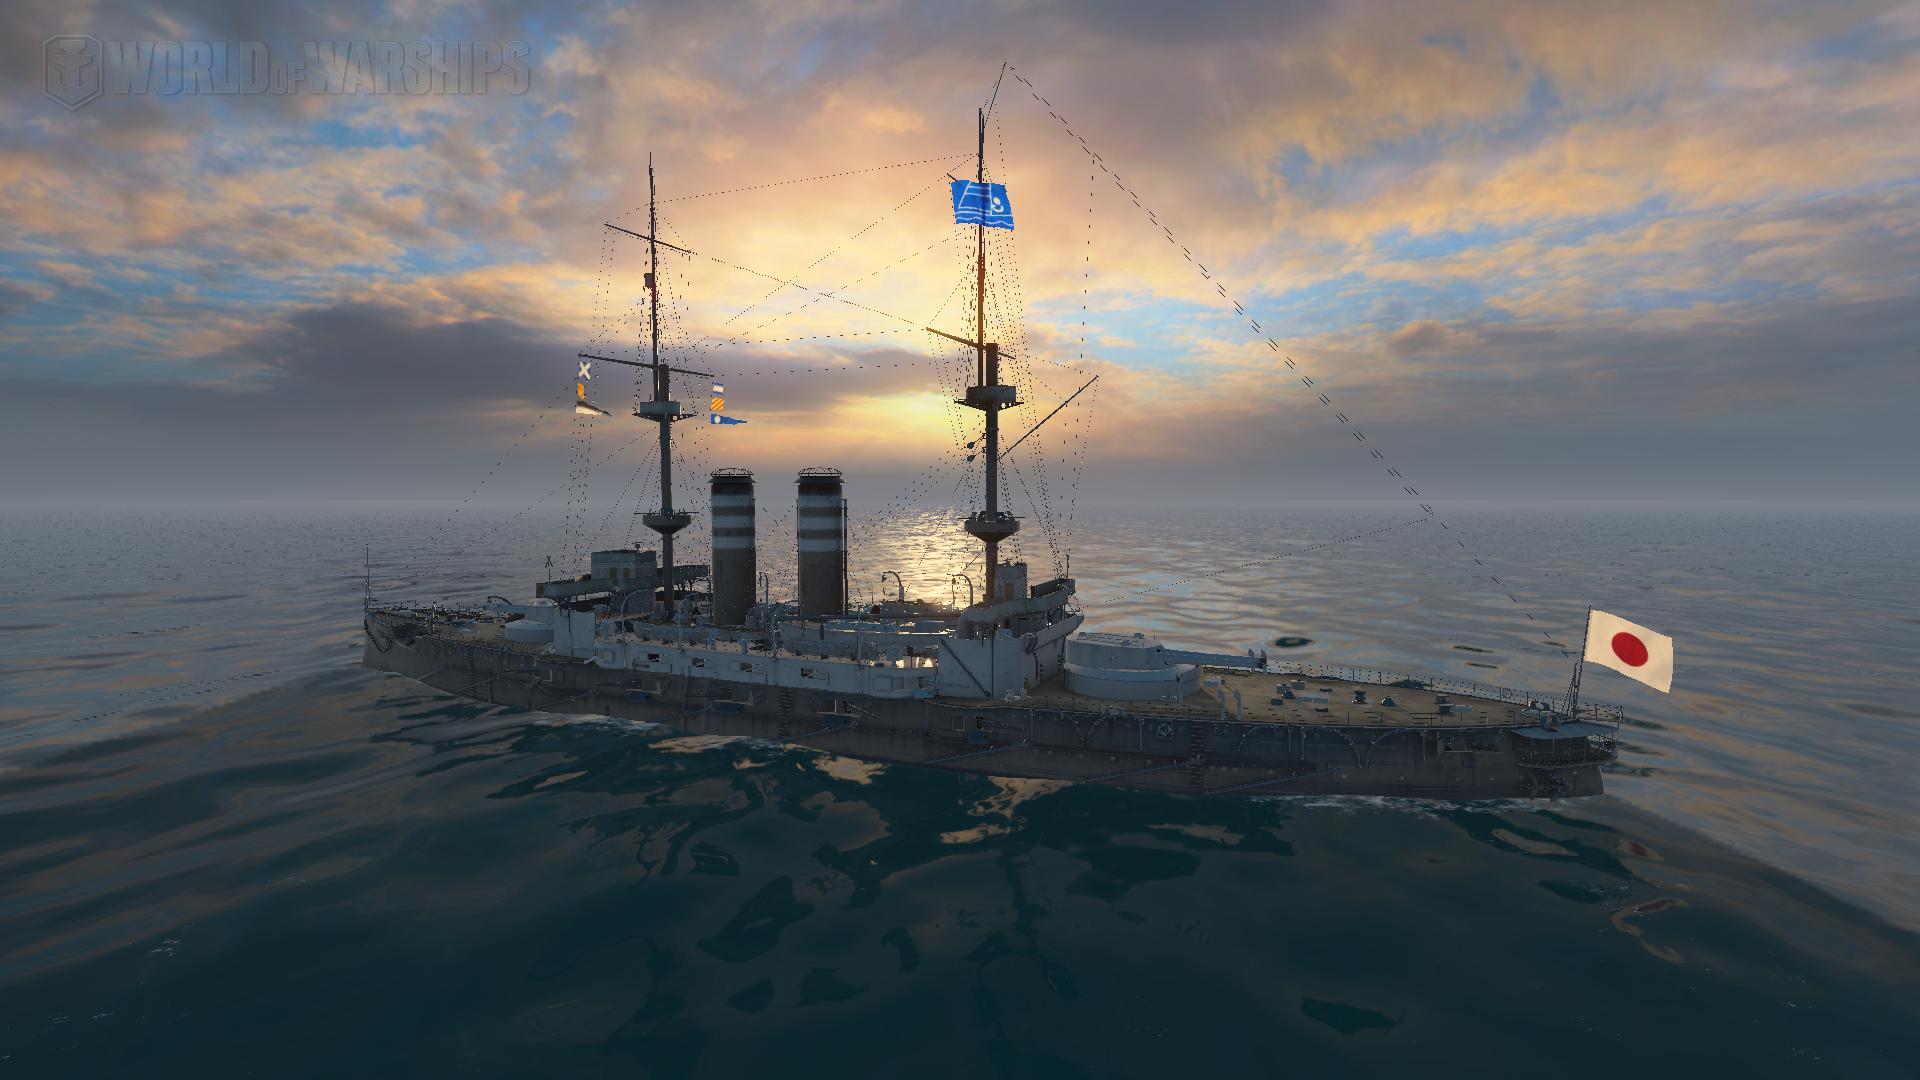 World_of_Warships_11_15_2016_10_51_58_PM